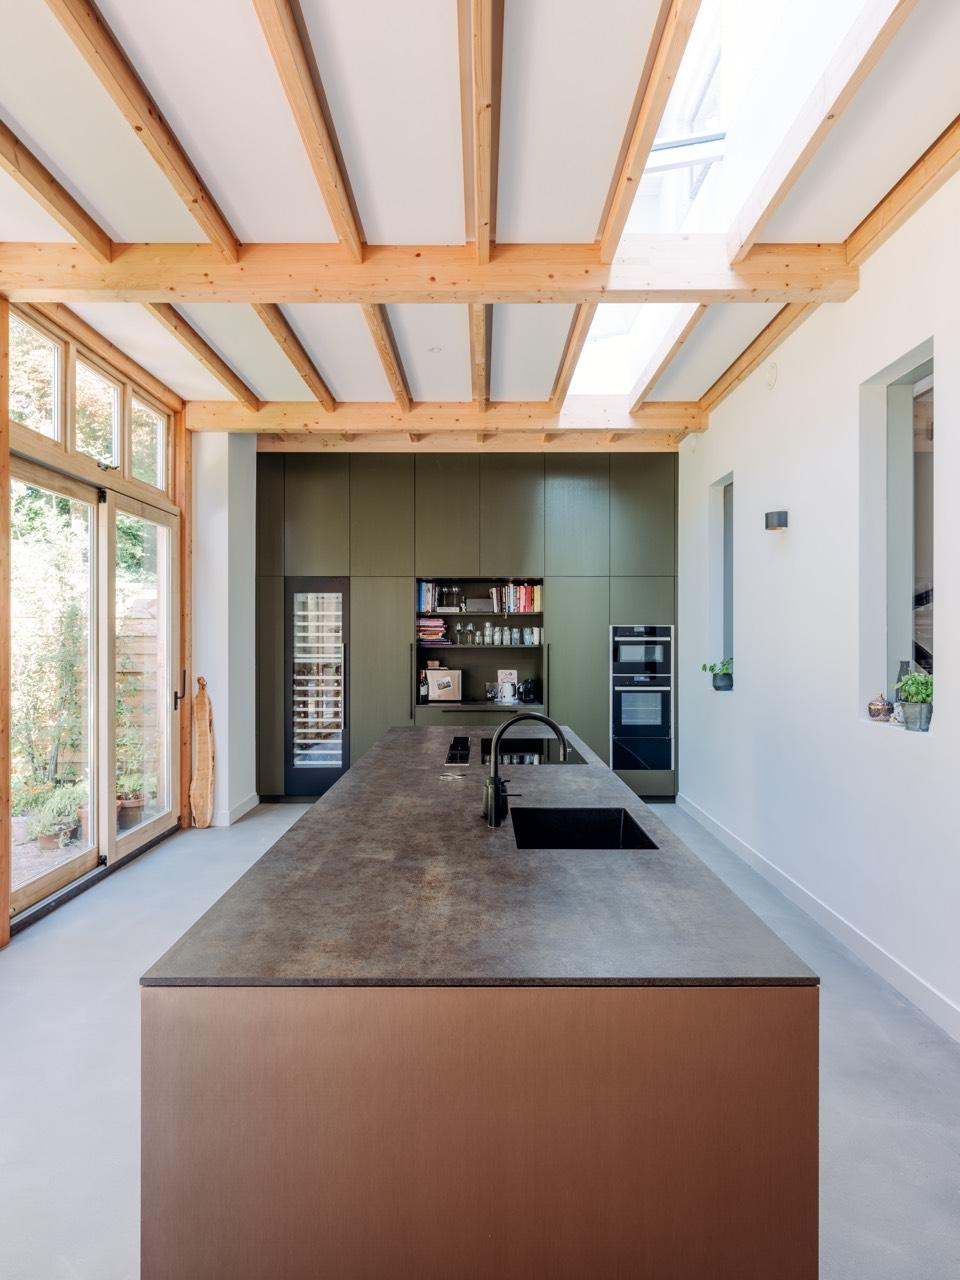 overveen-evelijn-ferwerda-interieur-design-keuken